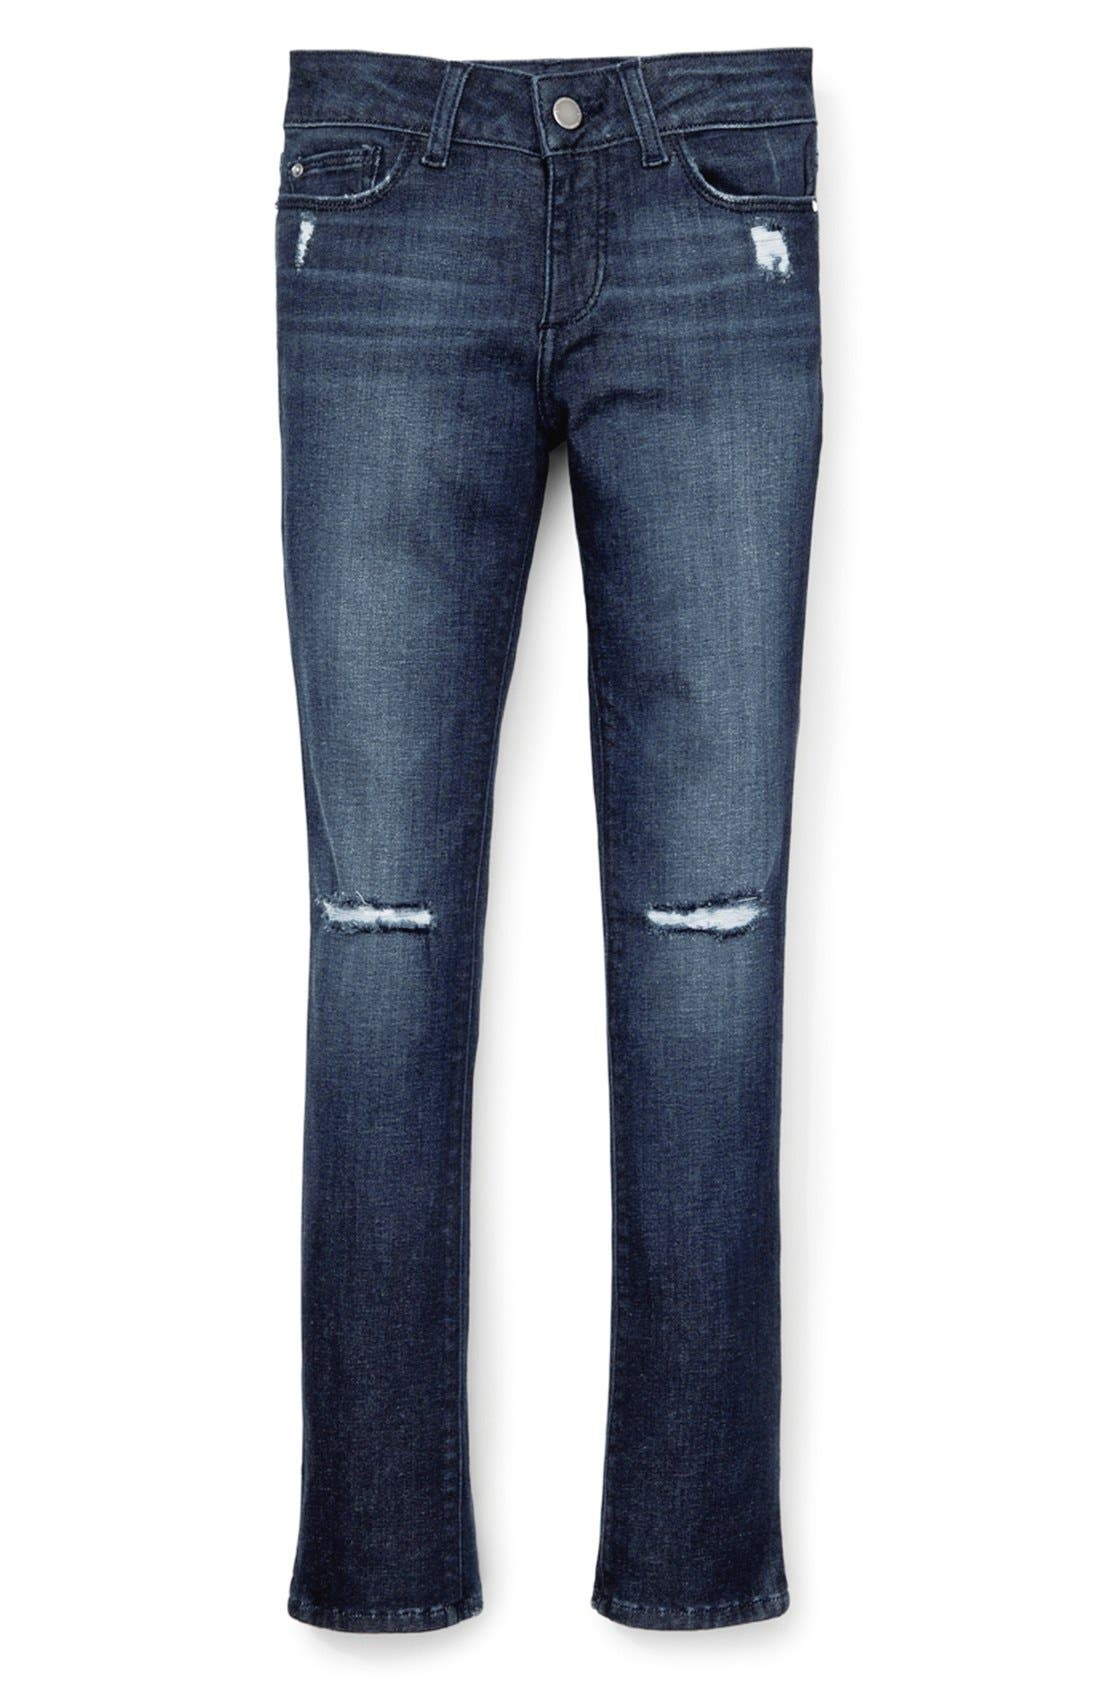 DL1961 'Chloe' Stretch Denim Skinny Jeans (Big Girls)